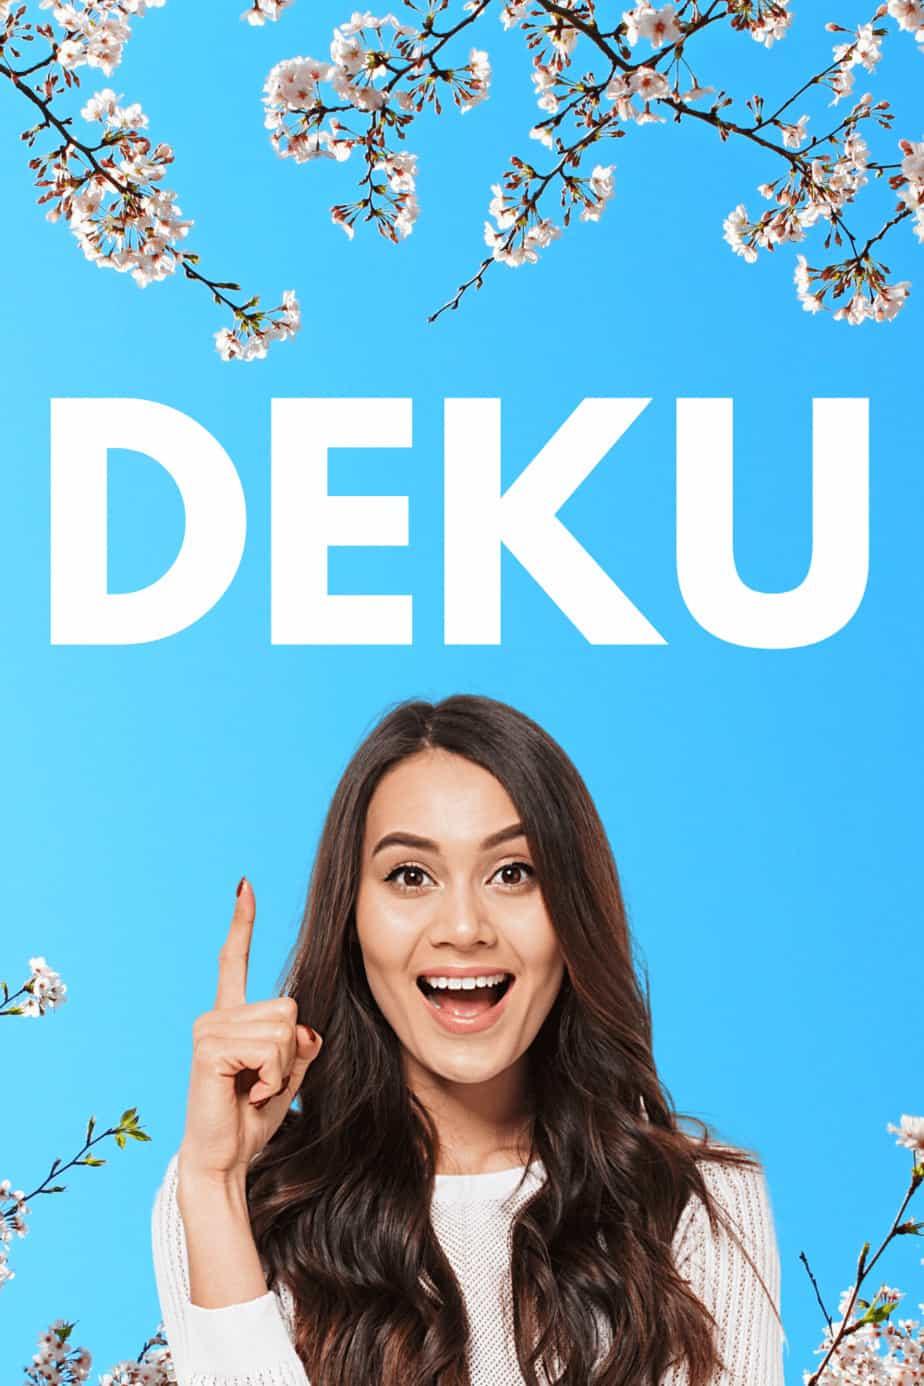 The True Meaning of Deku